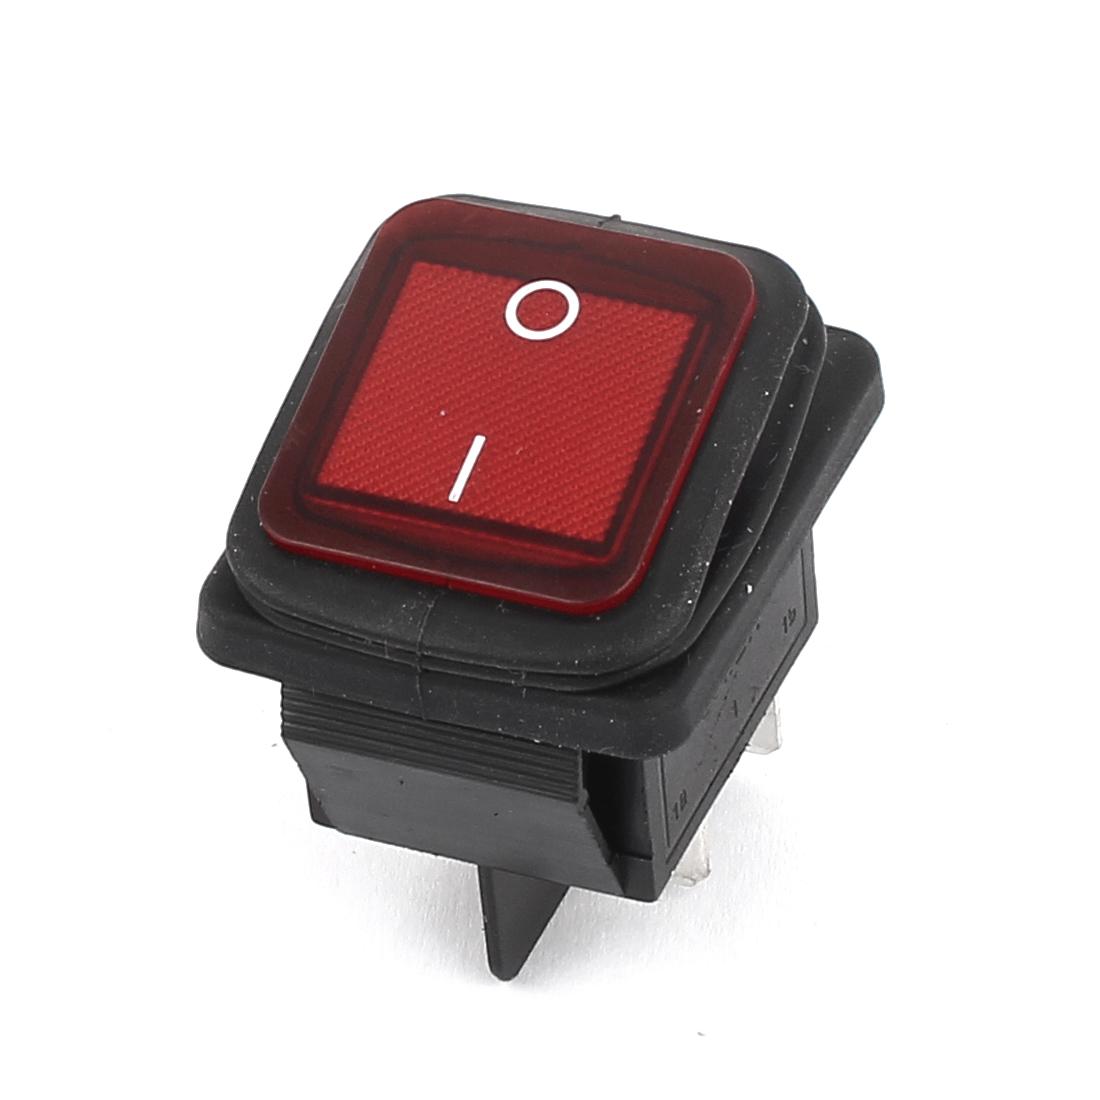 AC 250V/125V 16A/20A DPST O/I 4Pin Red Light Waterproof Rocker Boat Switch